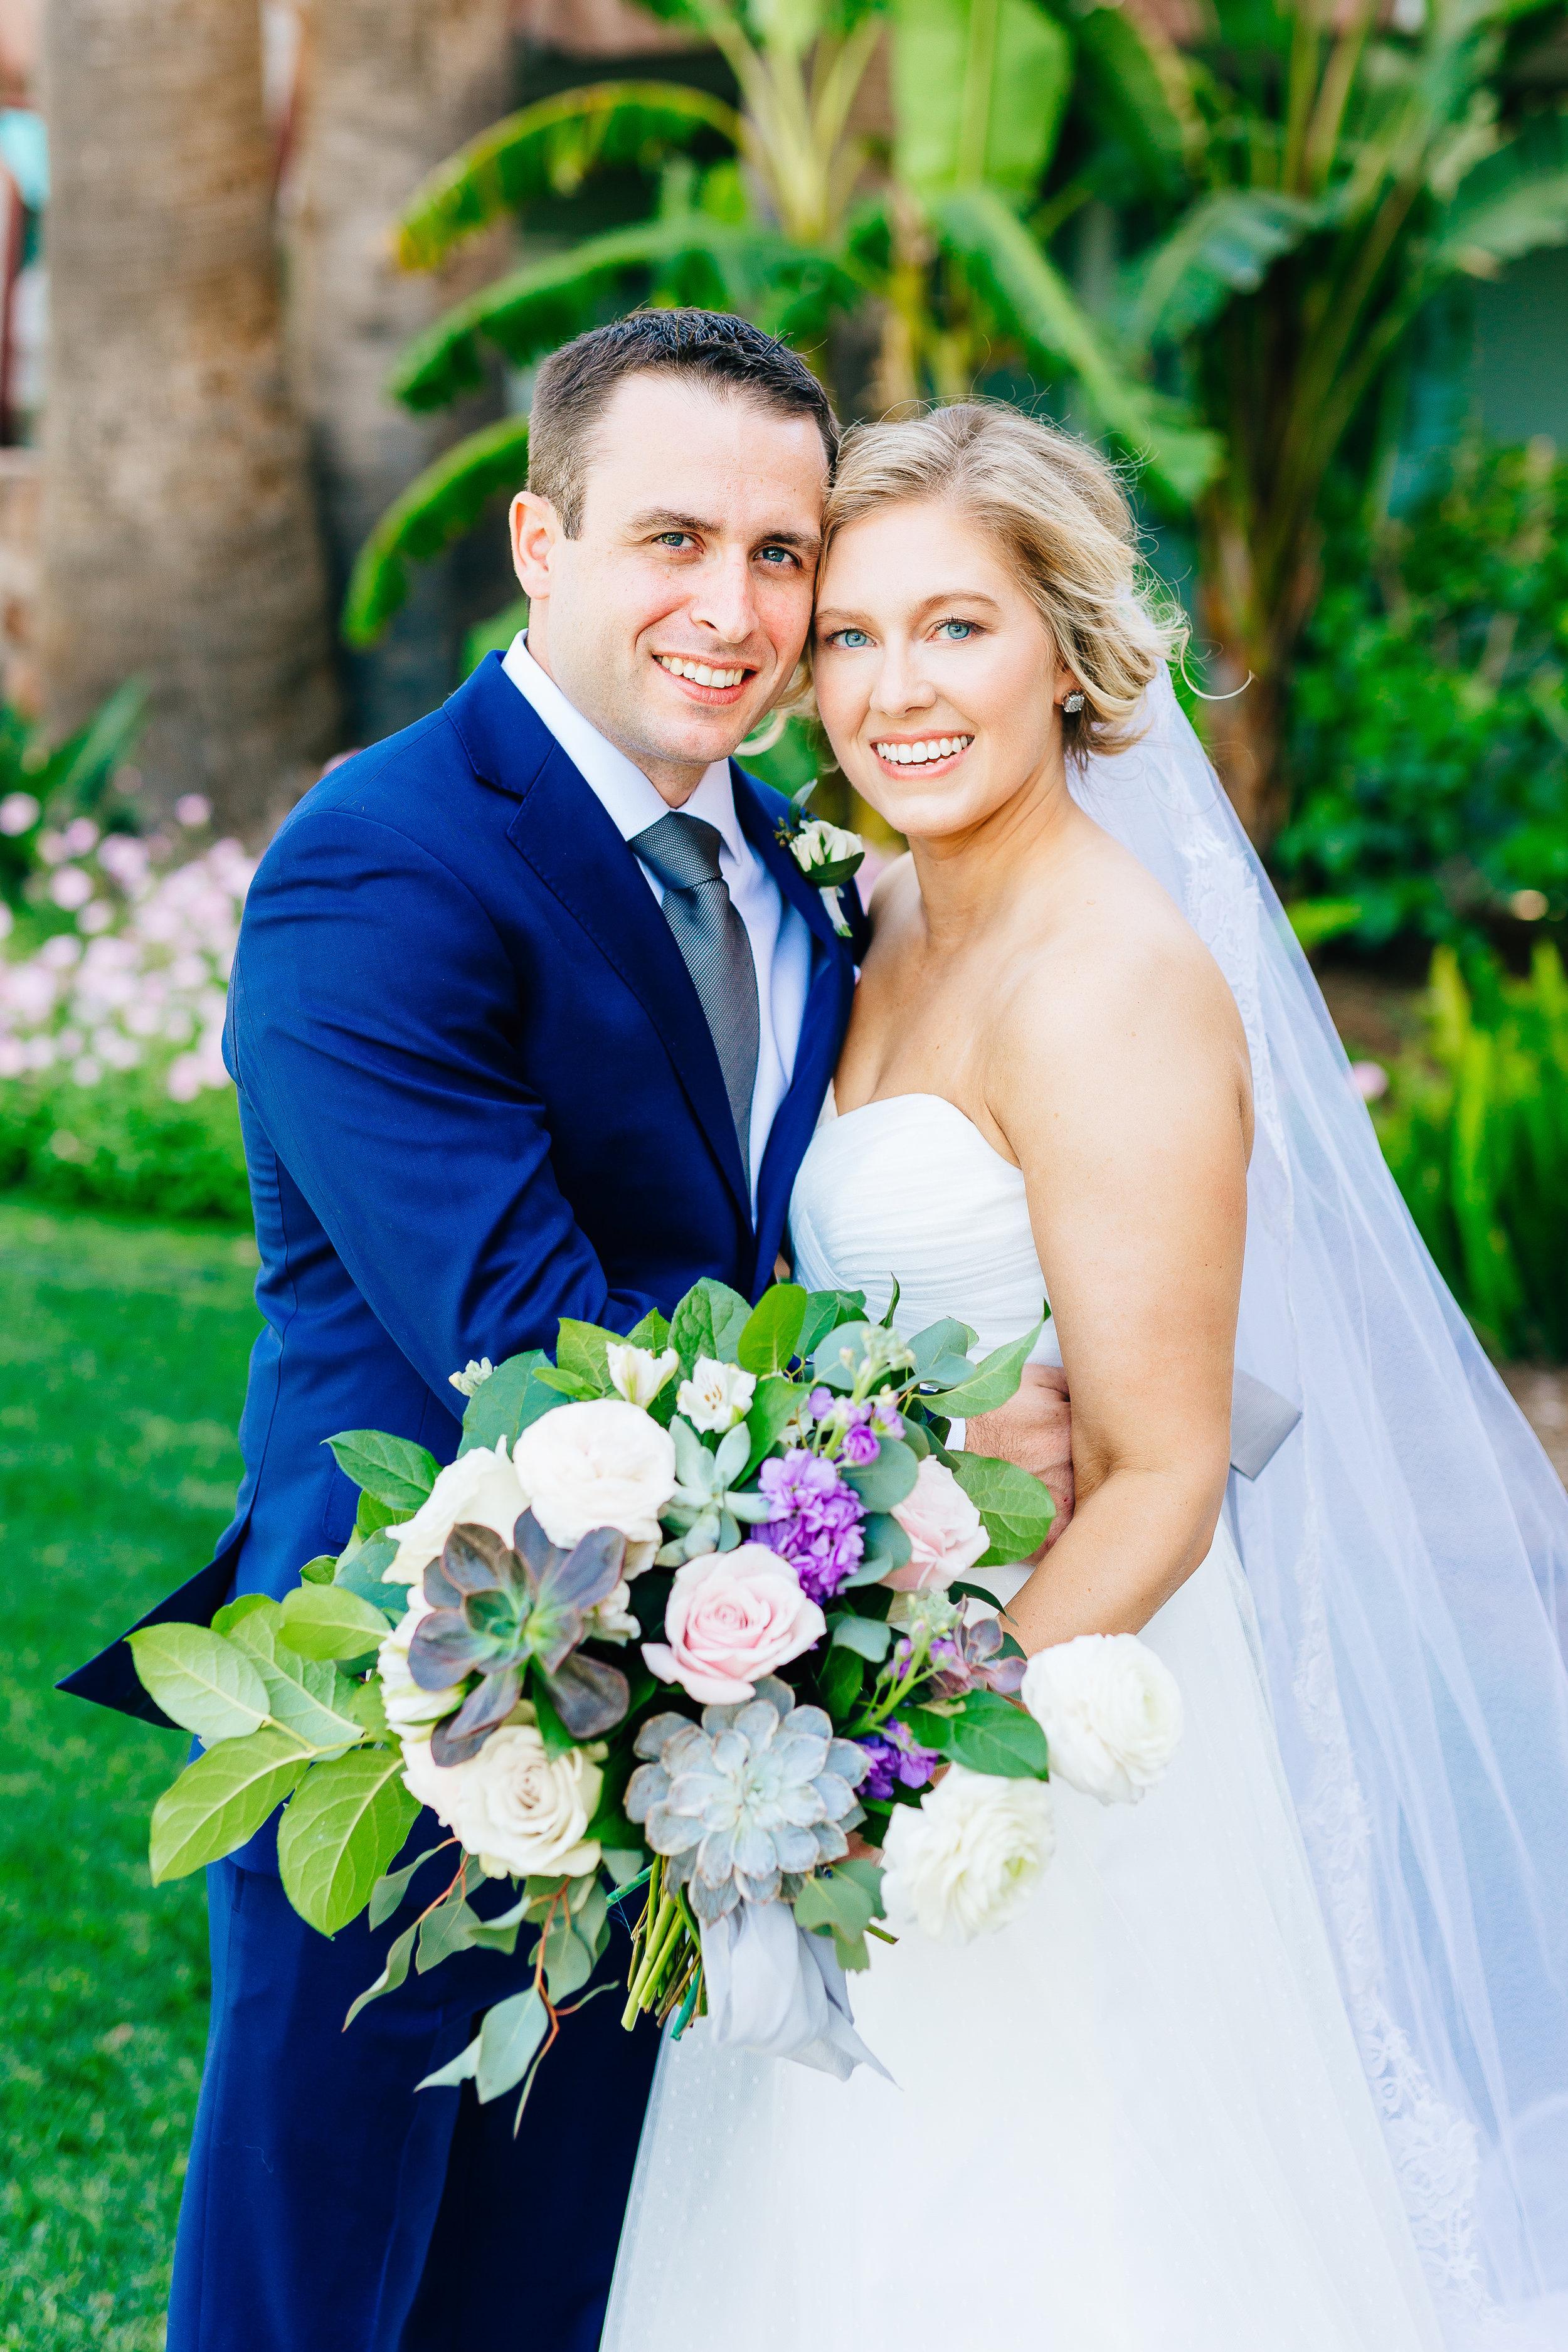 Desert Inspired Spring Wedding at Hotel Valley Ho